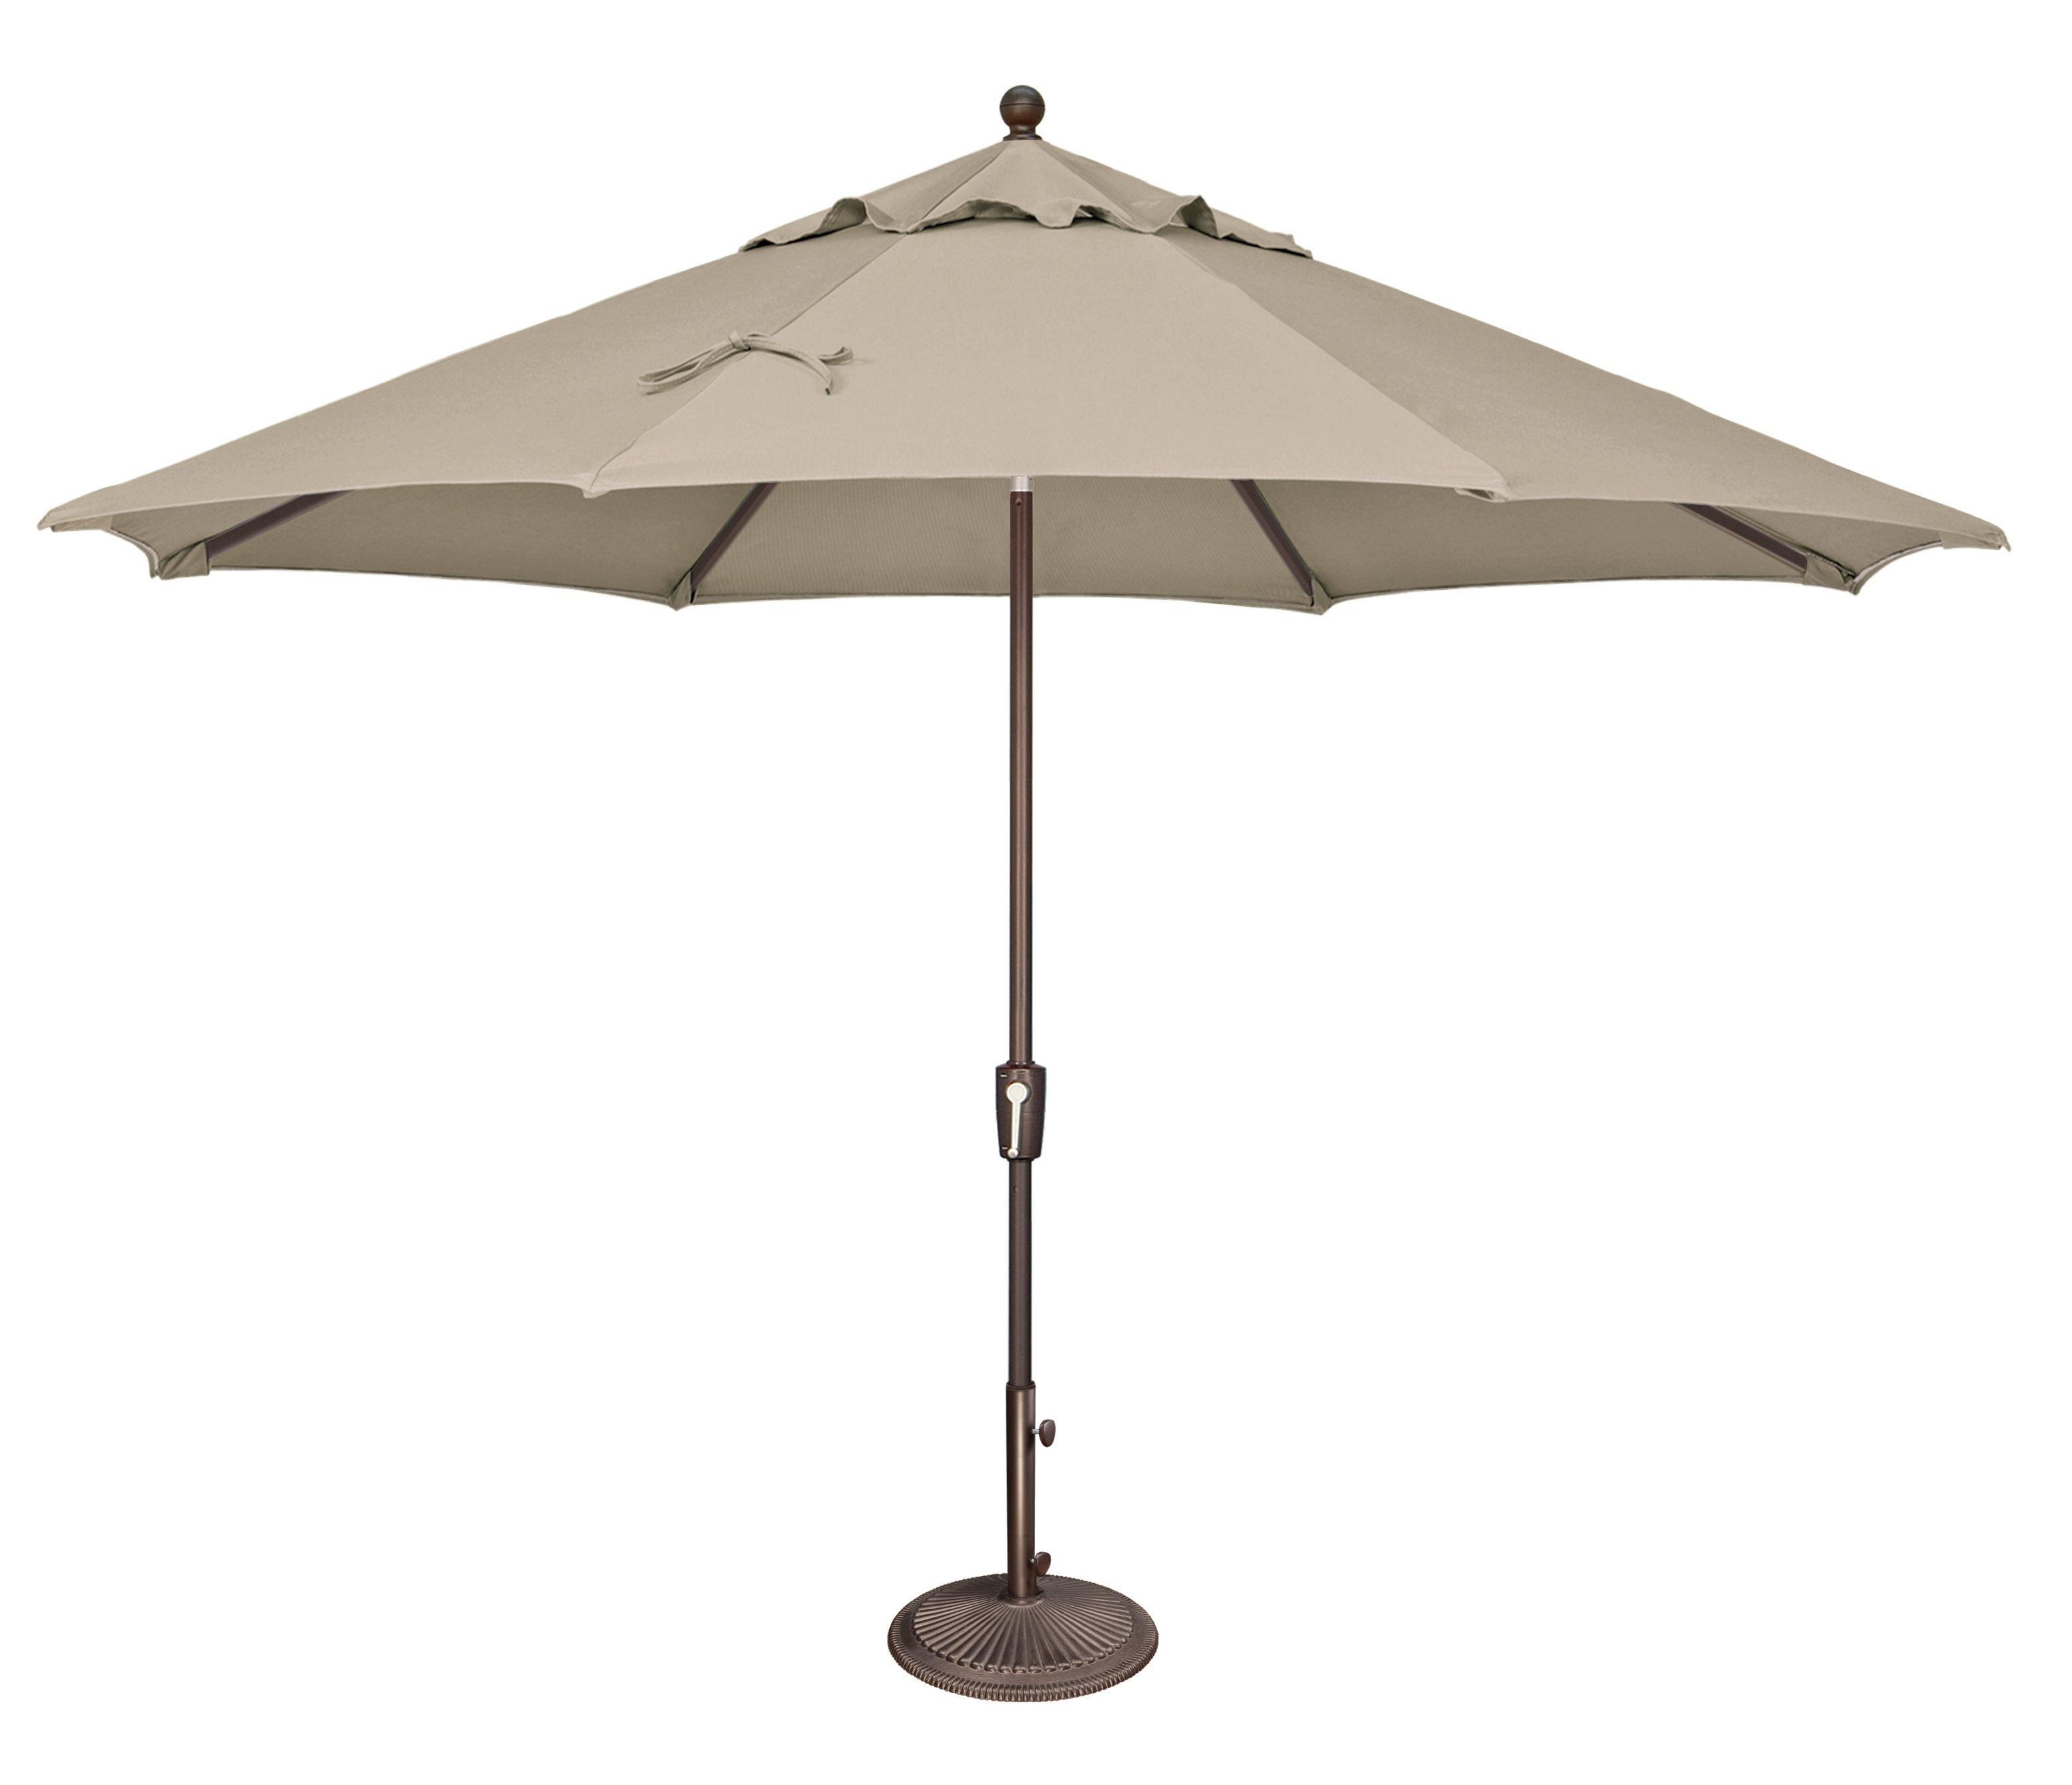 Launceston 11' Market Umbrella With Well Known Isom Market Umbrellas (View 13 of 20)